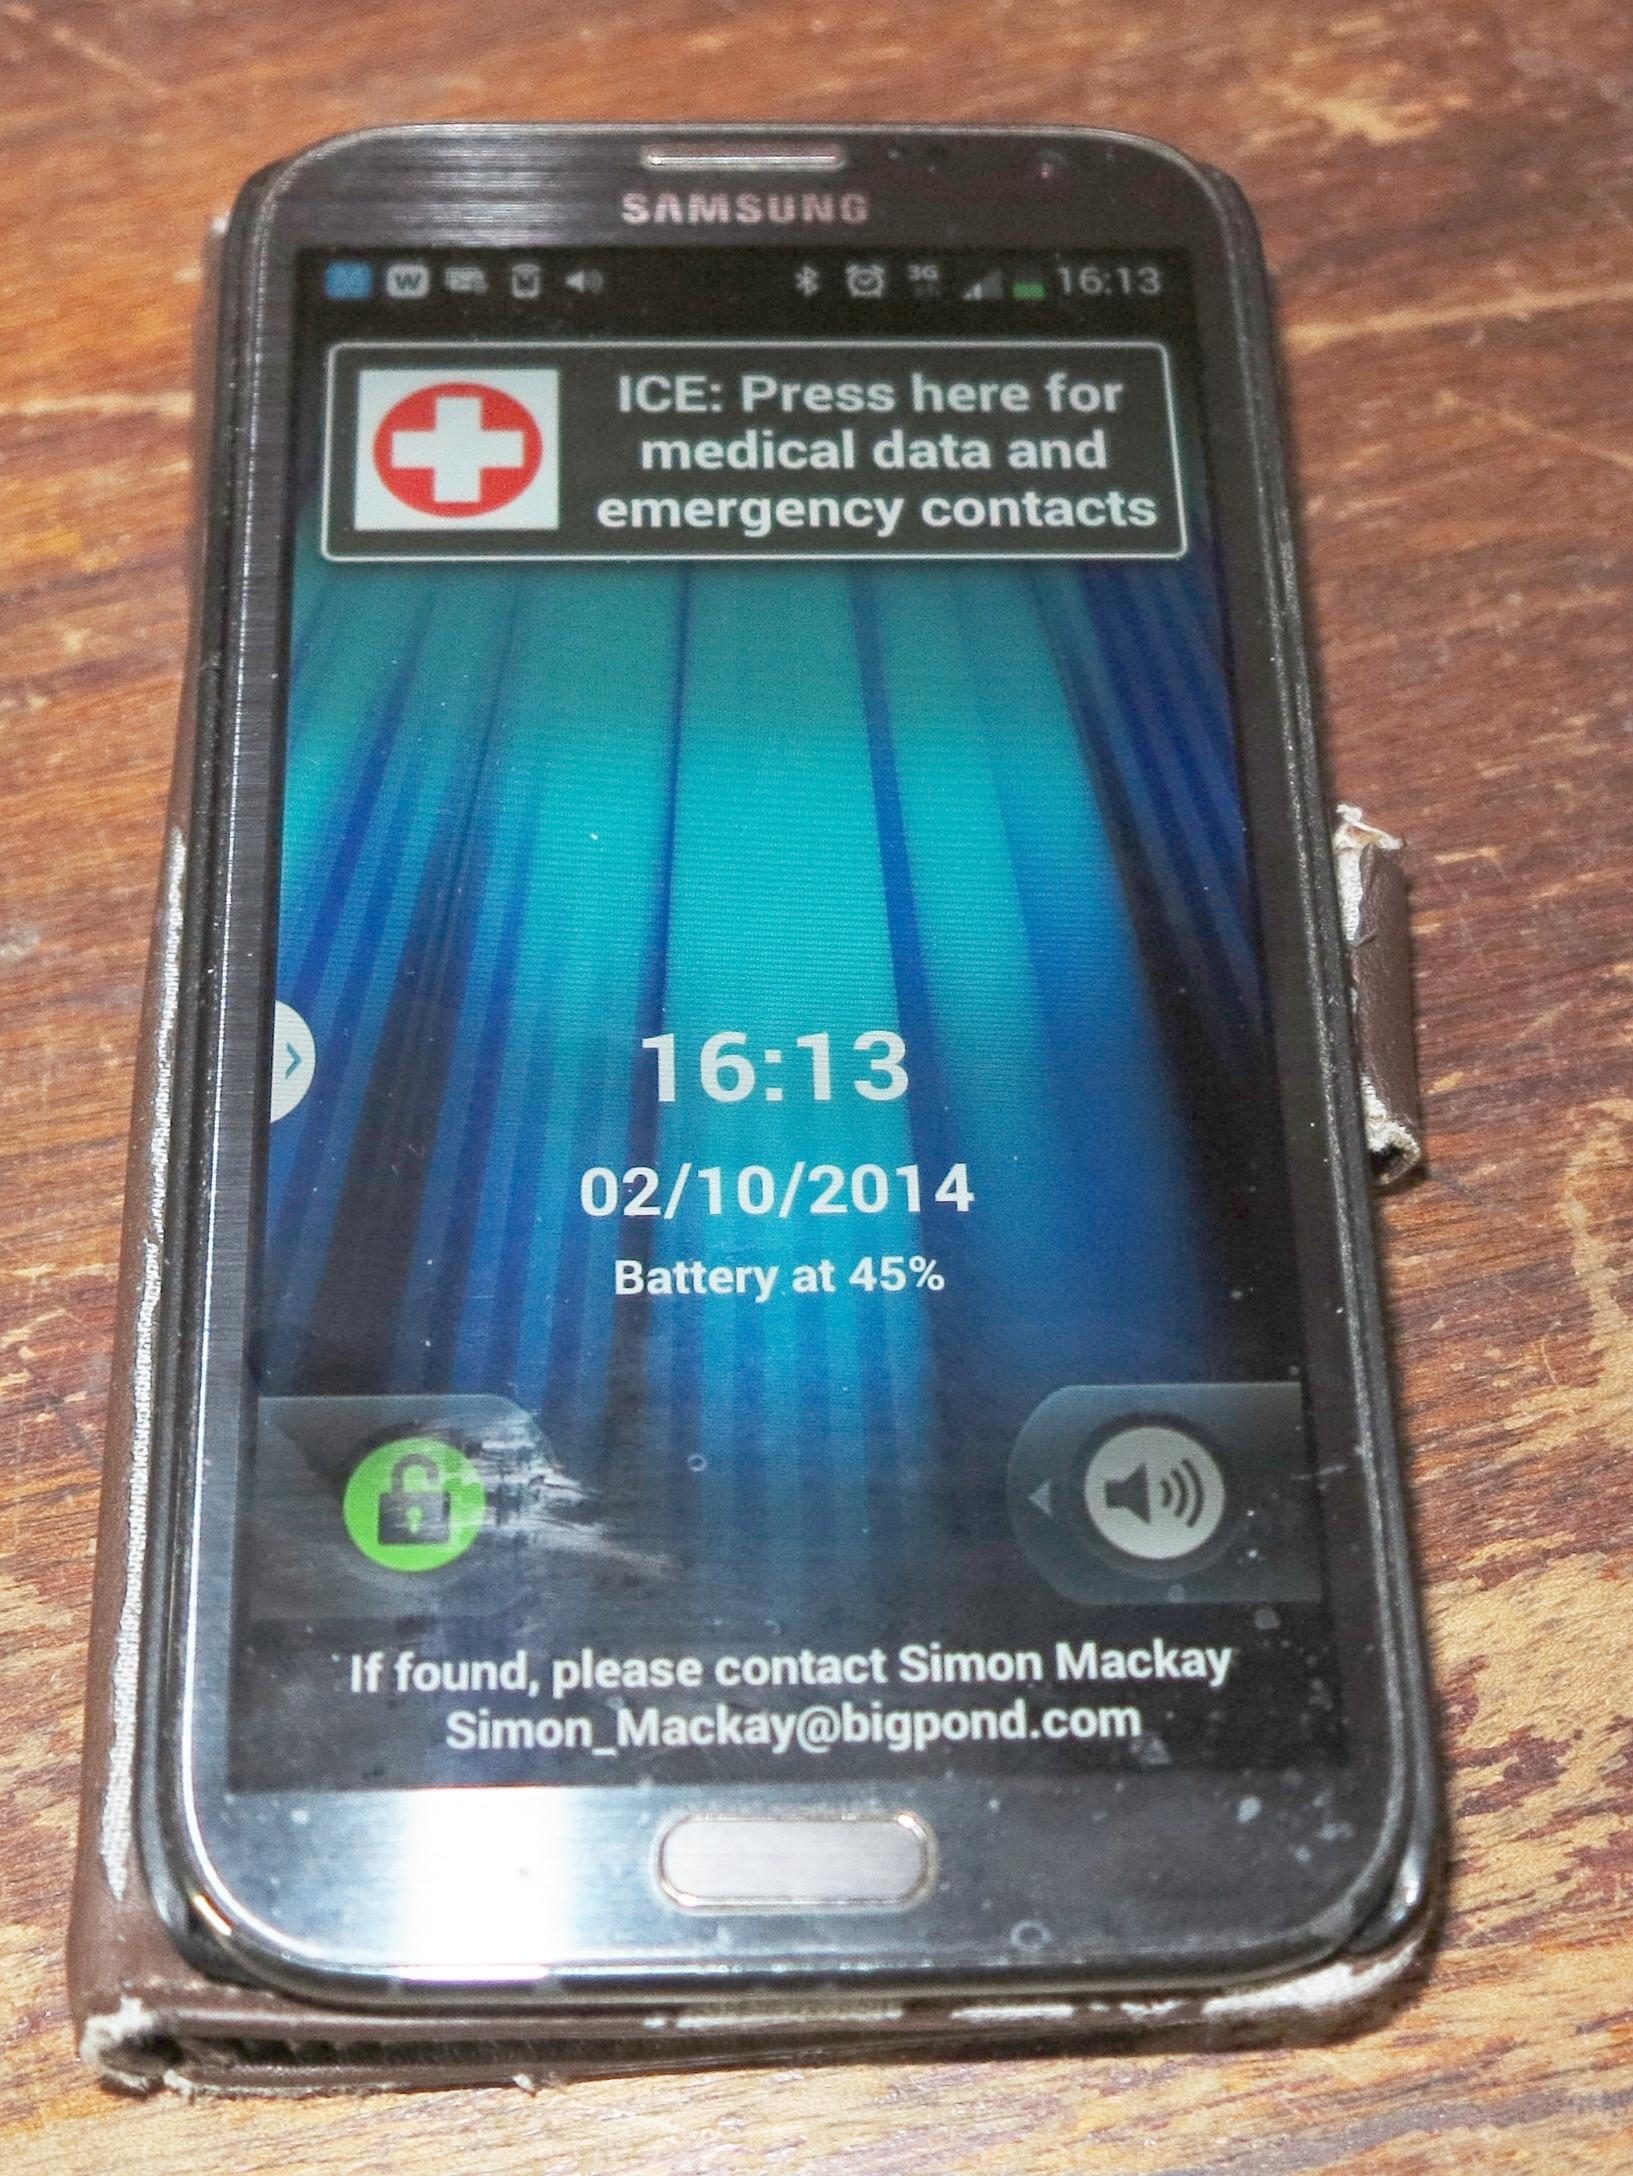 Samsung Galaxy Note 2 smartphone